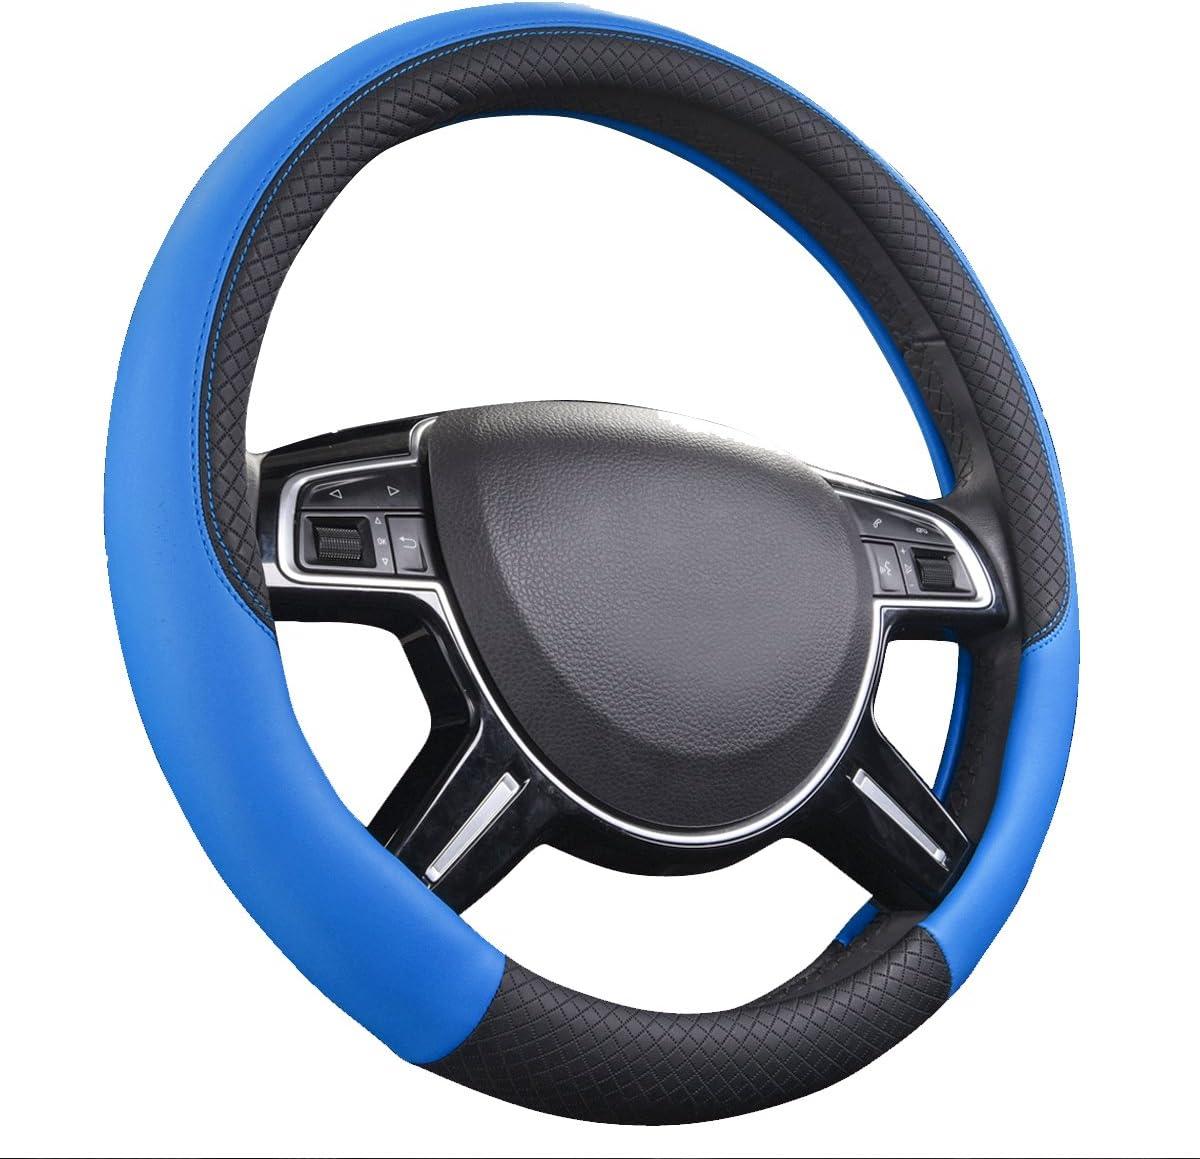 Fit for Suvs,Trucks,Cars,Sedans,Vans CAR PASS Rhombus Leather Universal Steering Wheel Cover Black and Blue